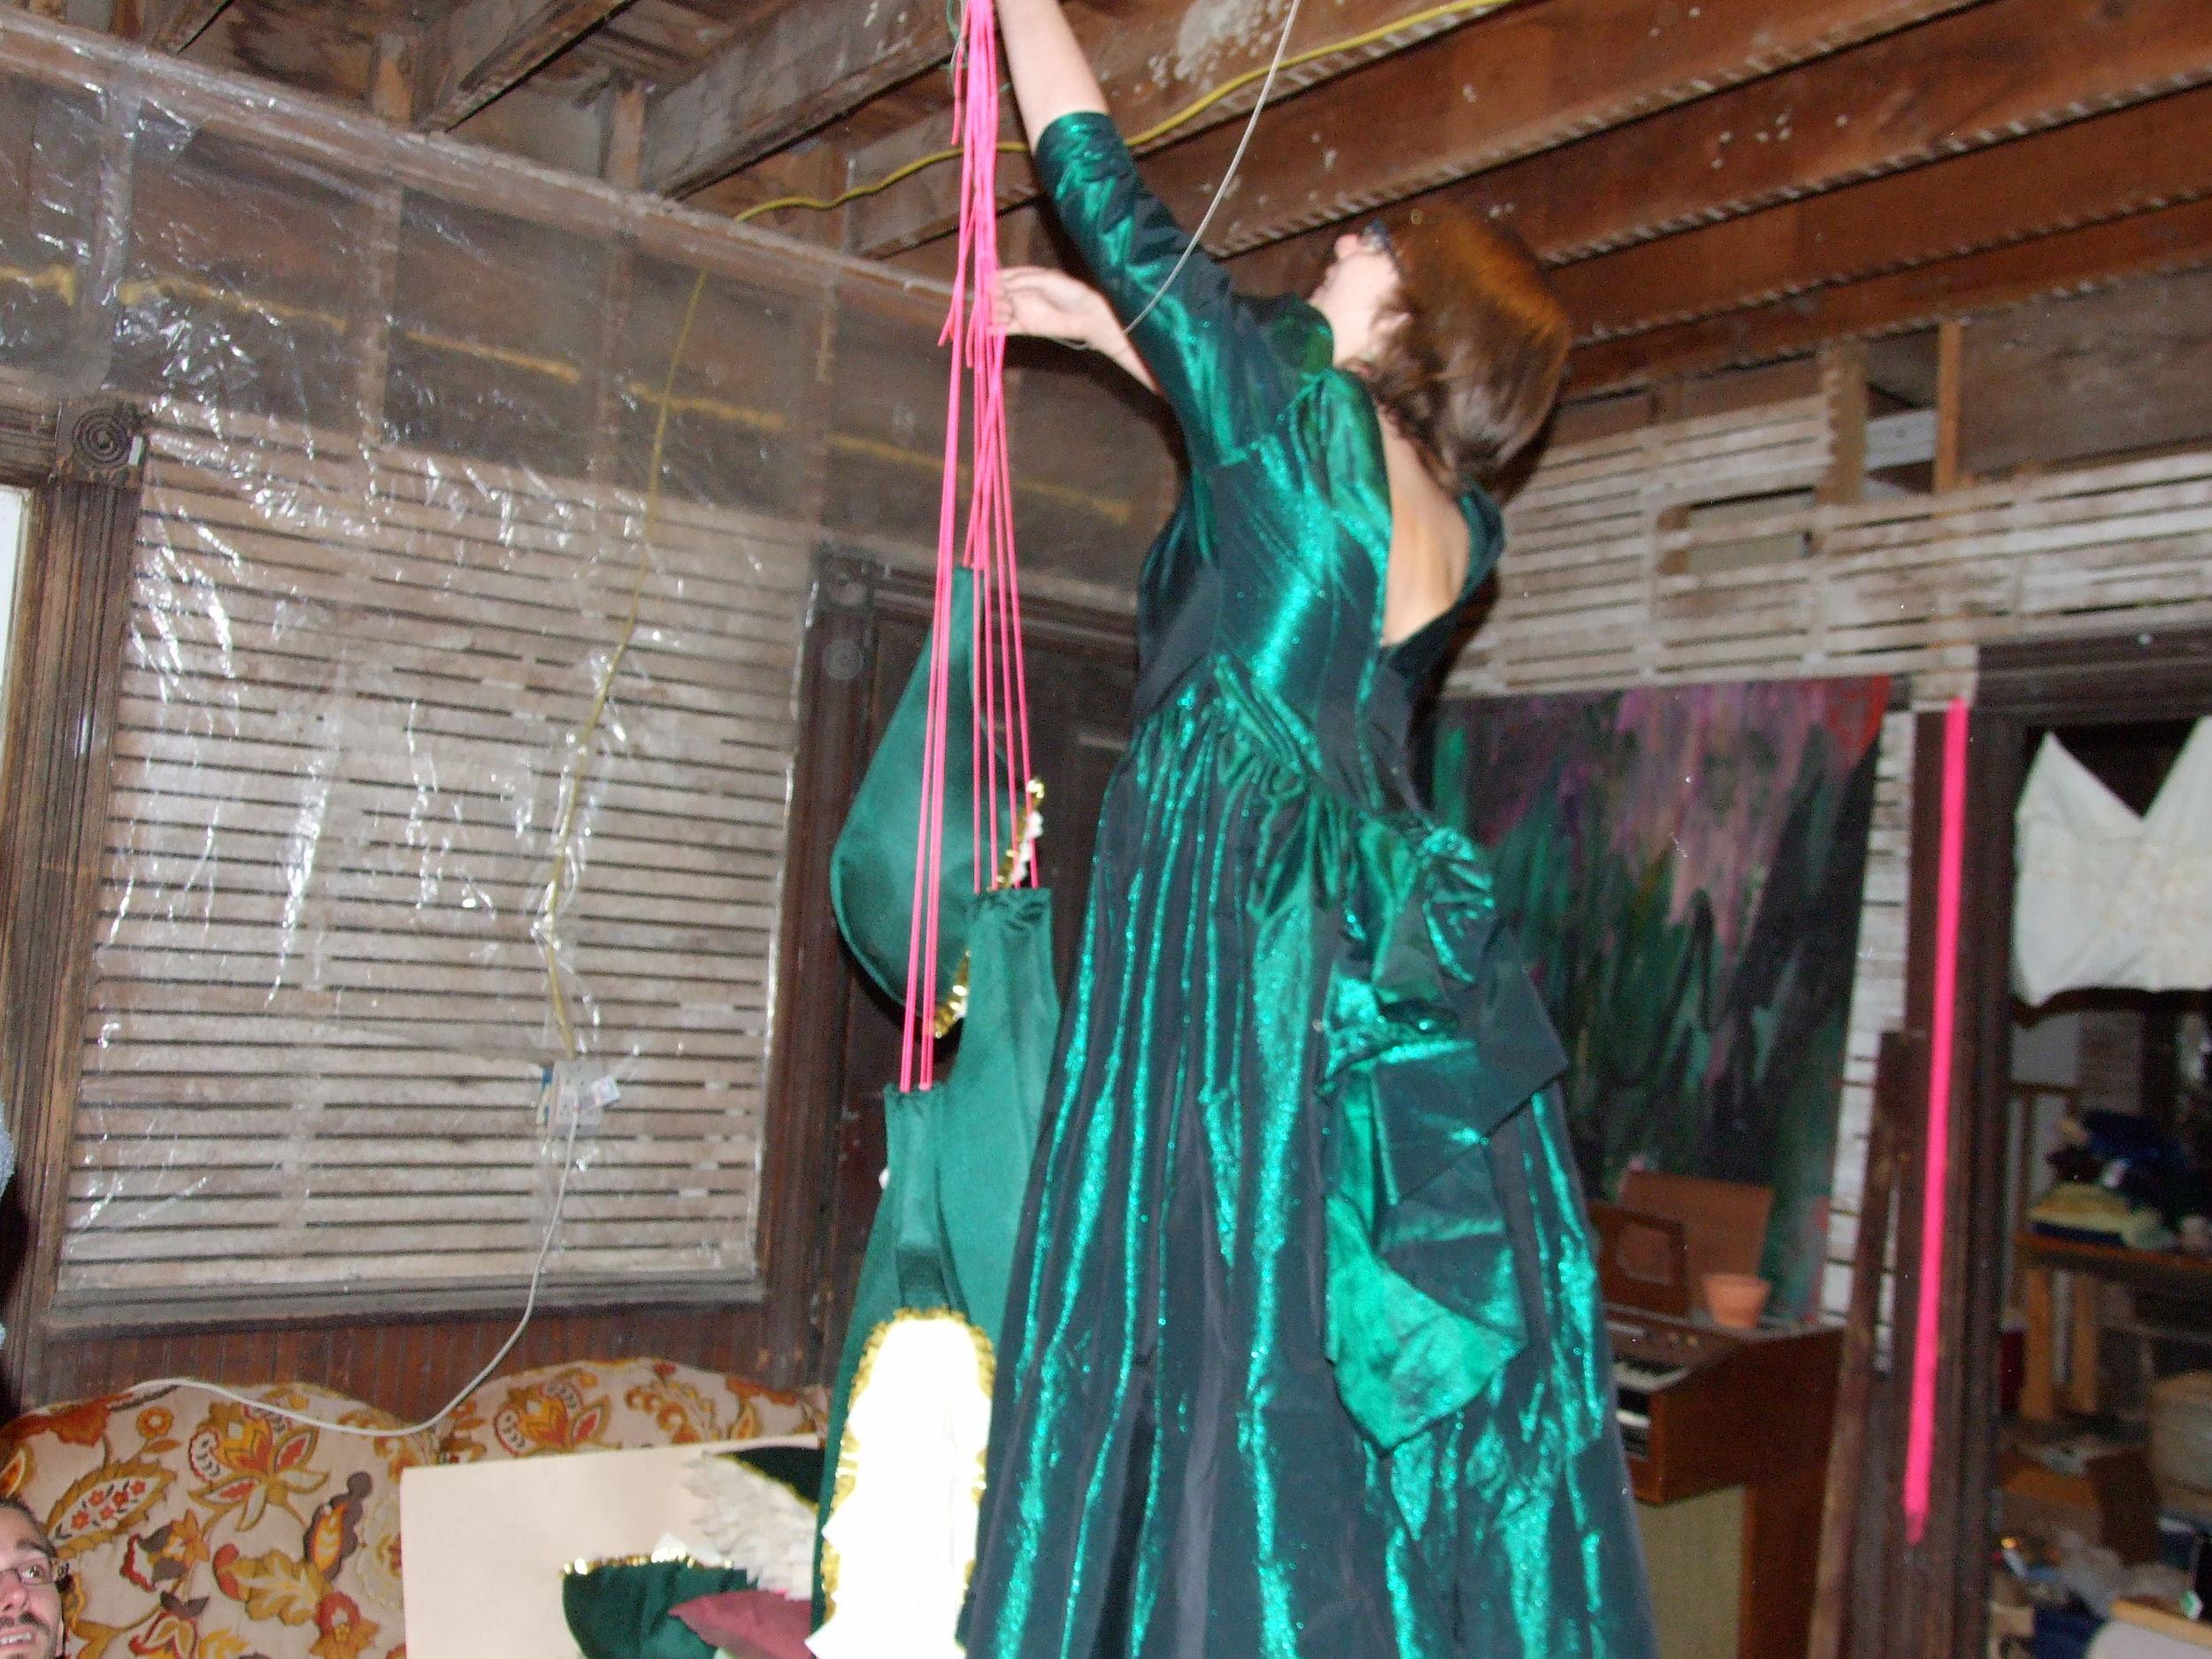 Hanging Jawbone sculptures in my fancy green dress.